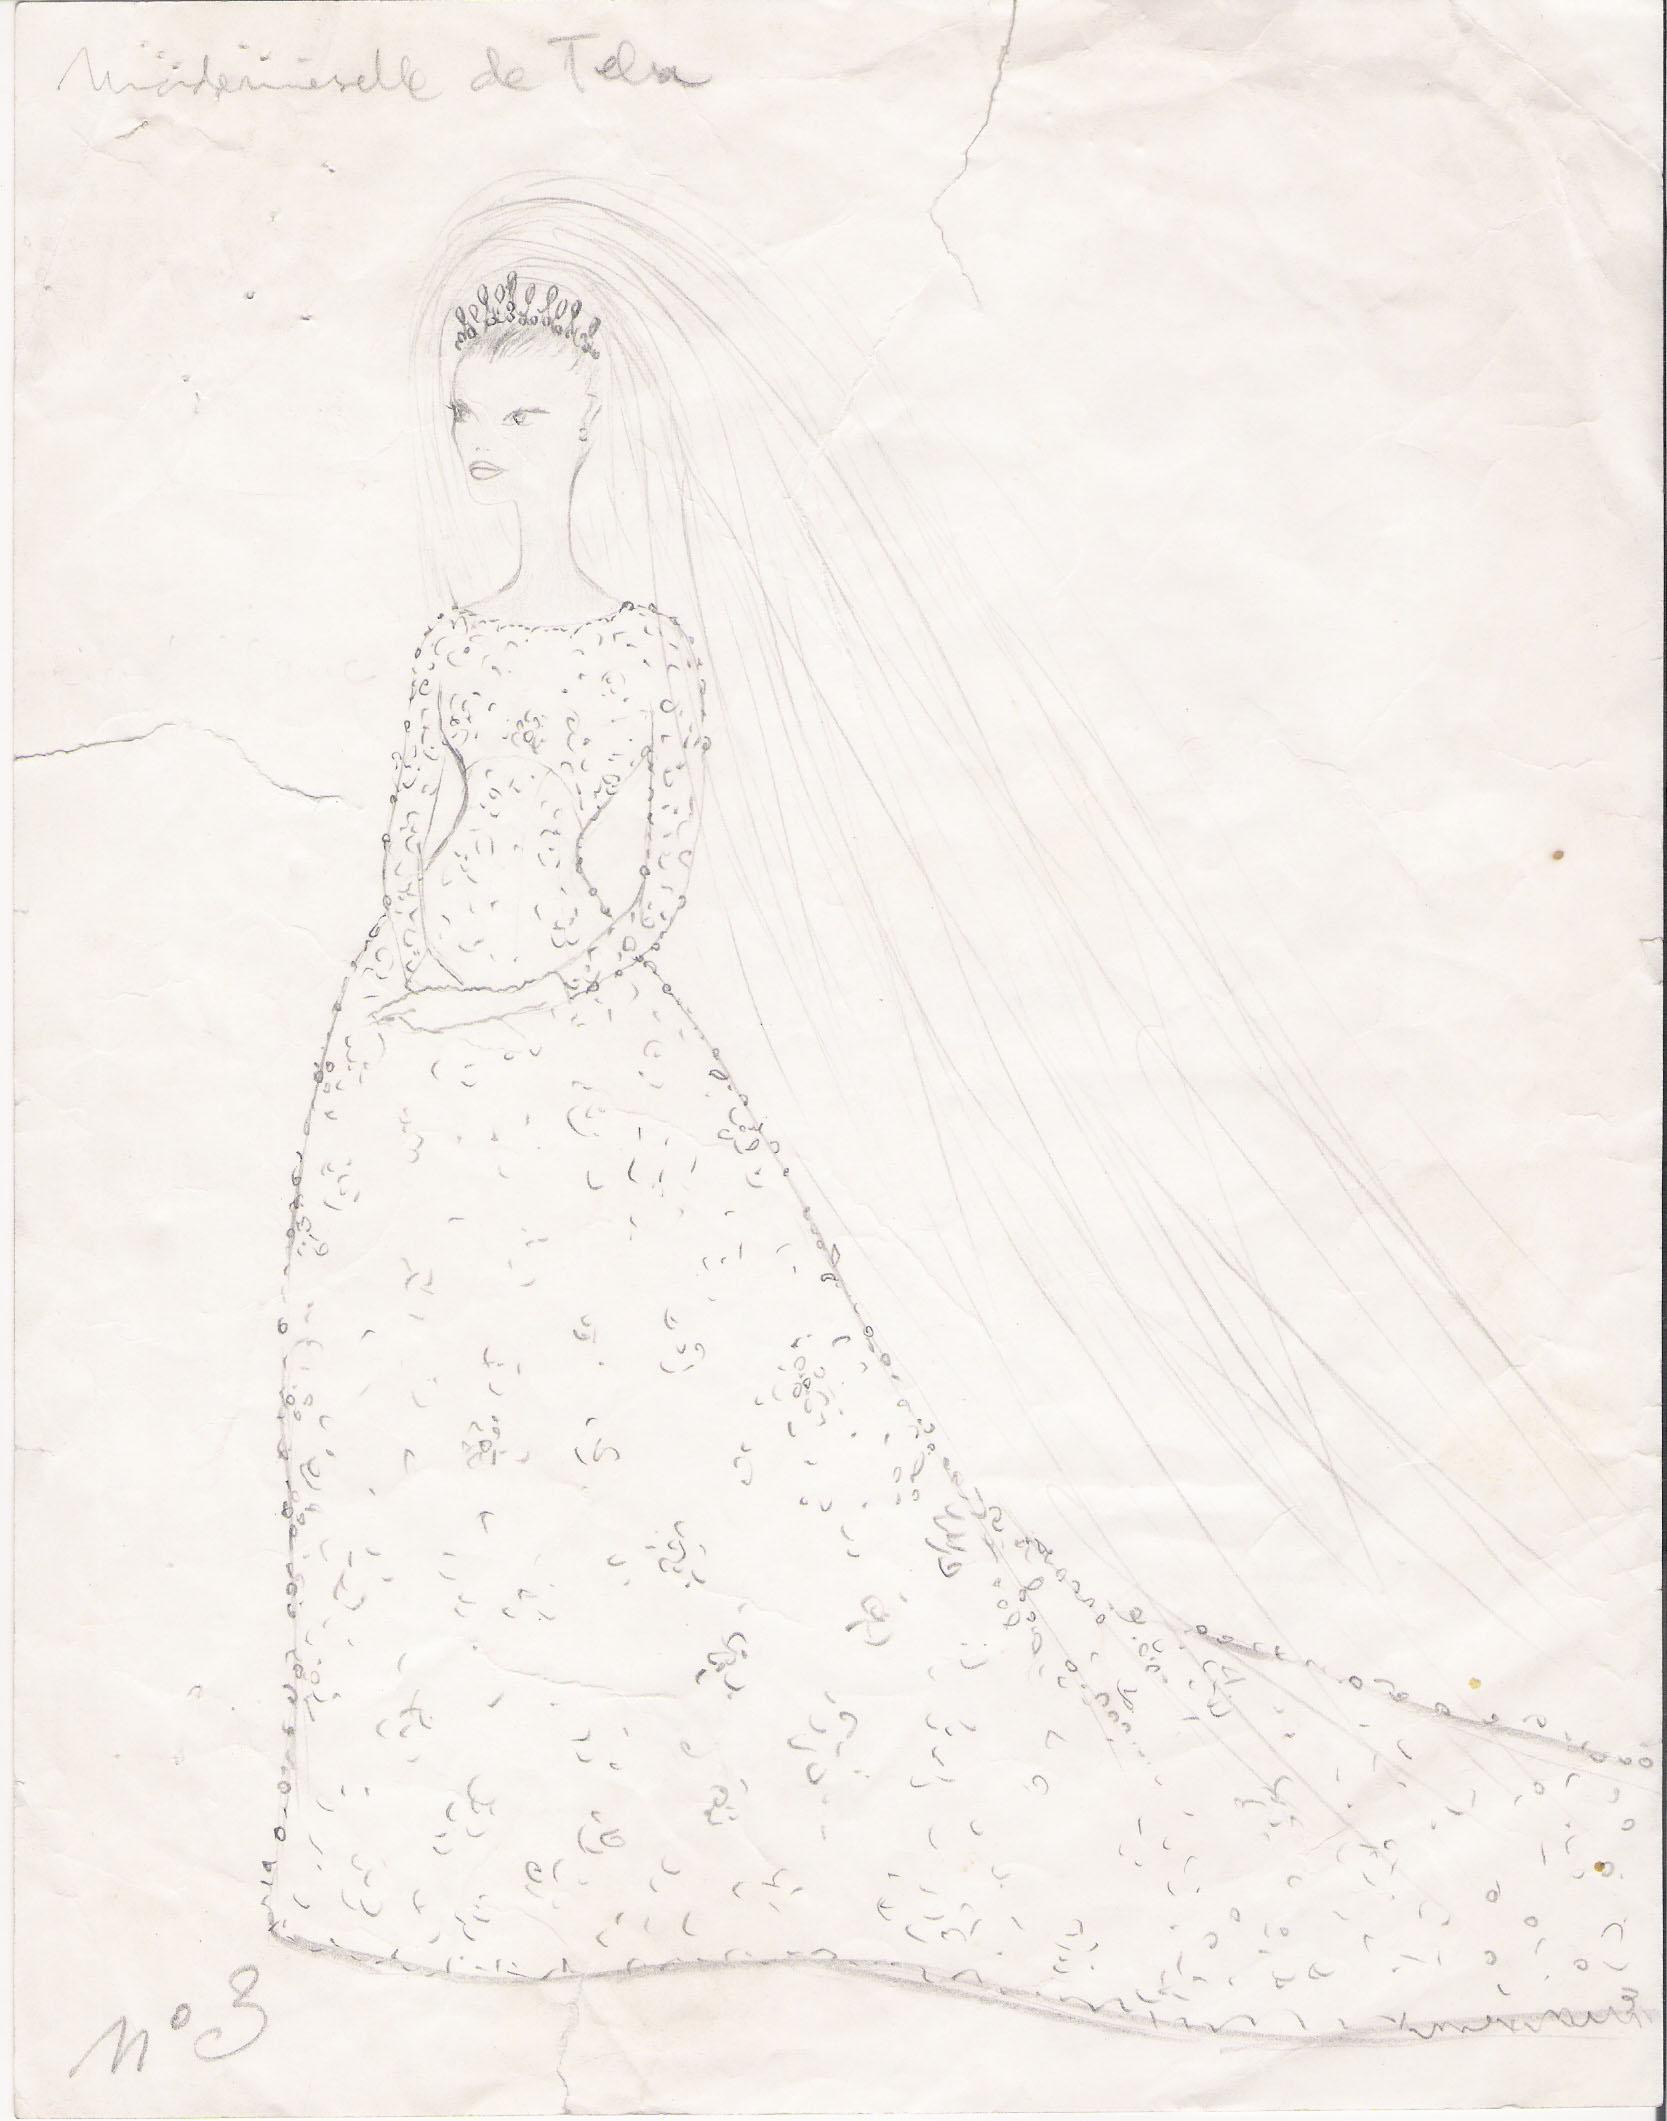 Dibujo a lápiz sobre papel de delantero de vestido de novia